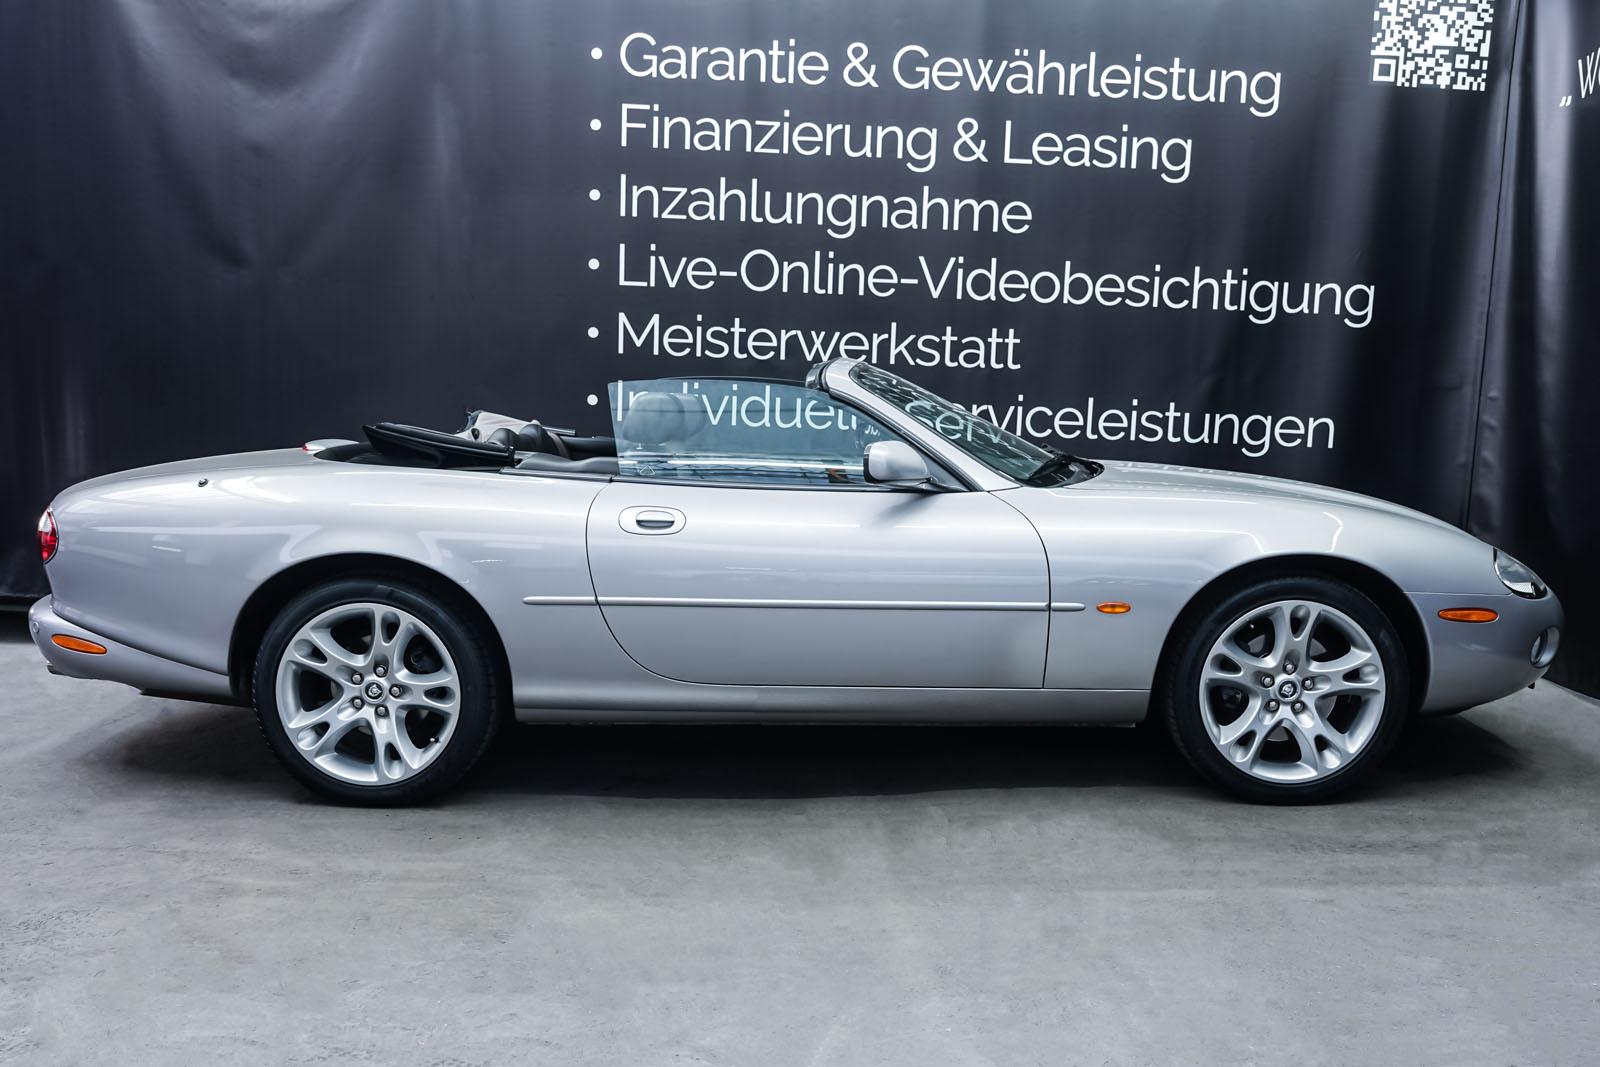 Jaguar_XK8_4.0_Silber_Schwarz_JAG-9731_19_w